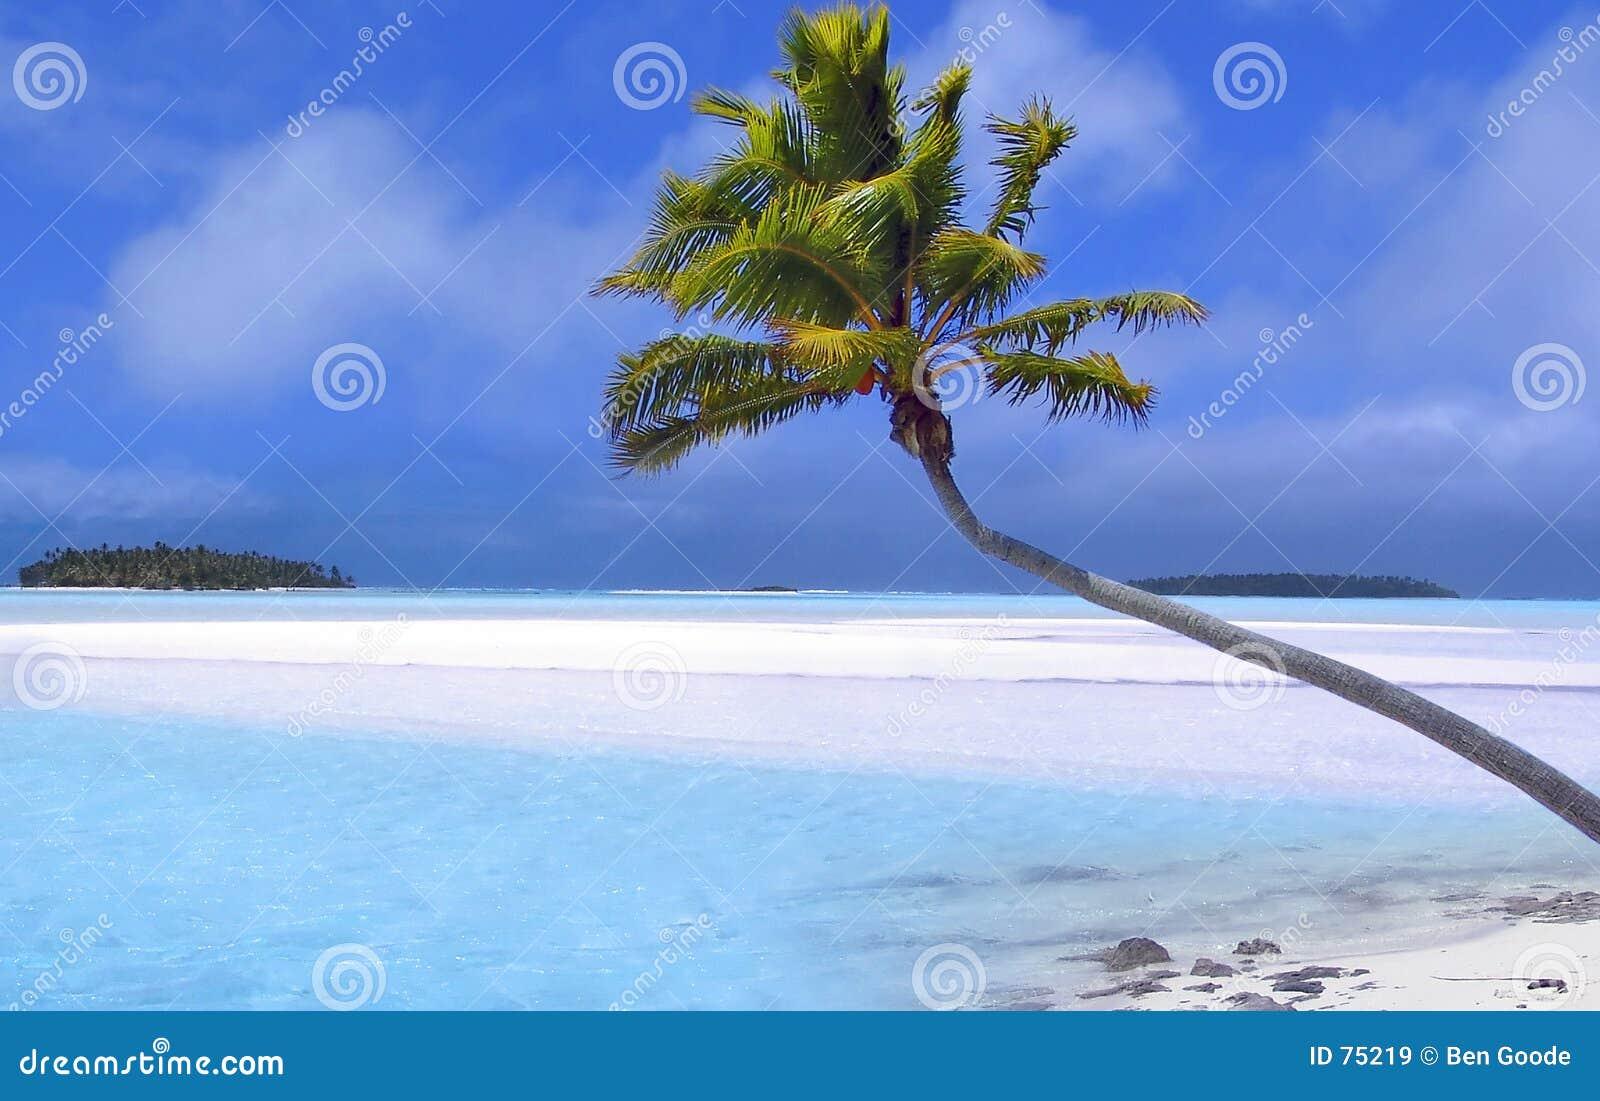 Rêve tropical